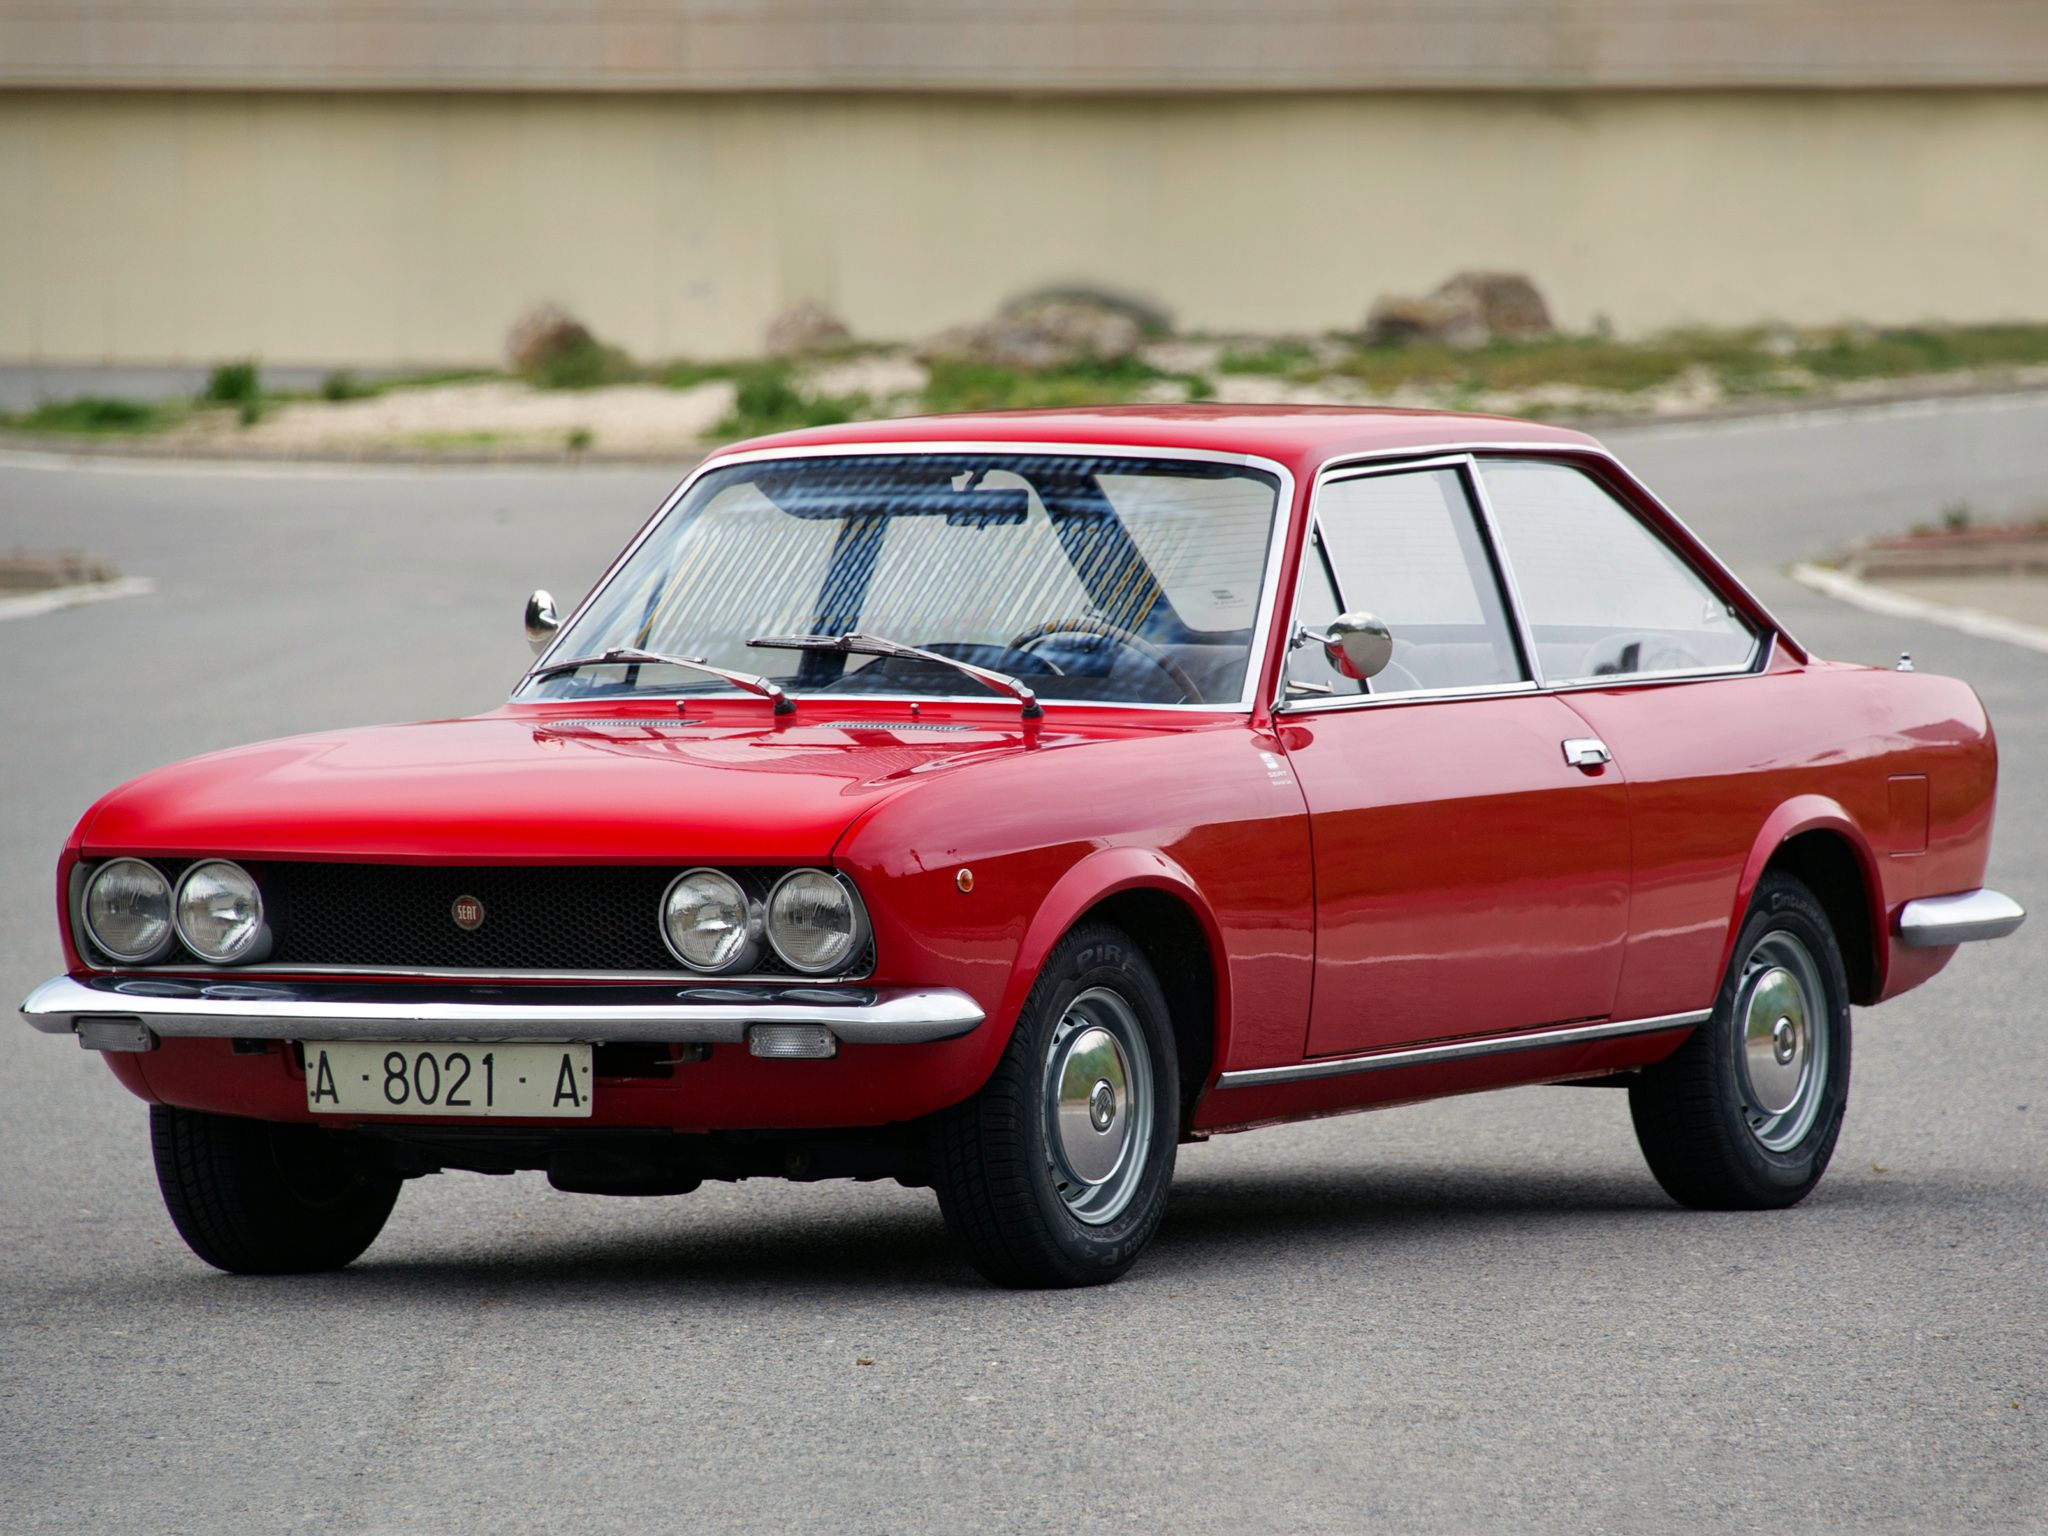 1970 73 Seat 124 Sport Coupe Con Imagenes Coches Clasicos